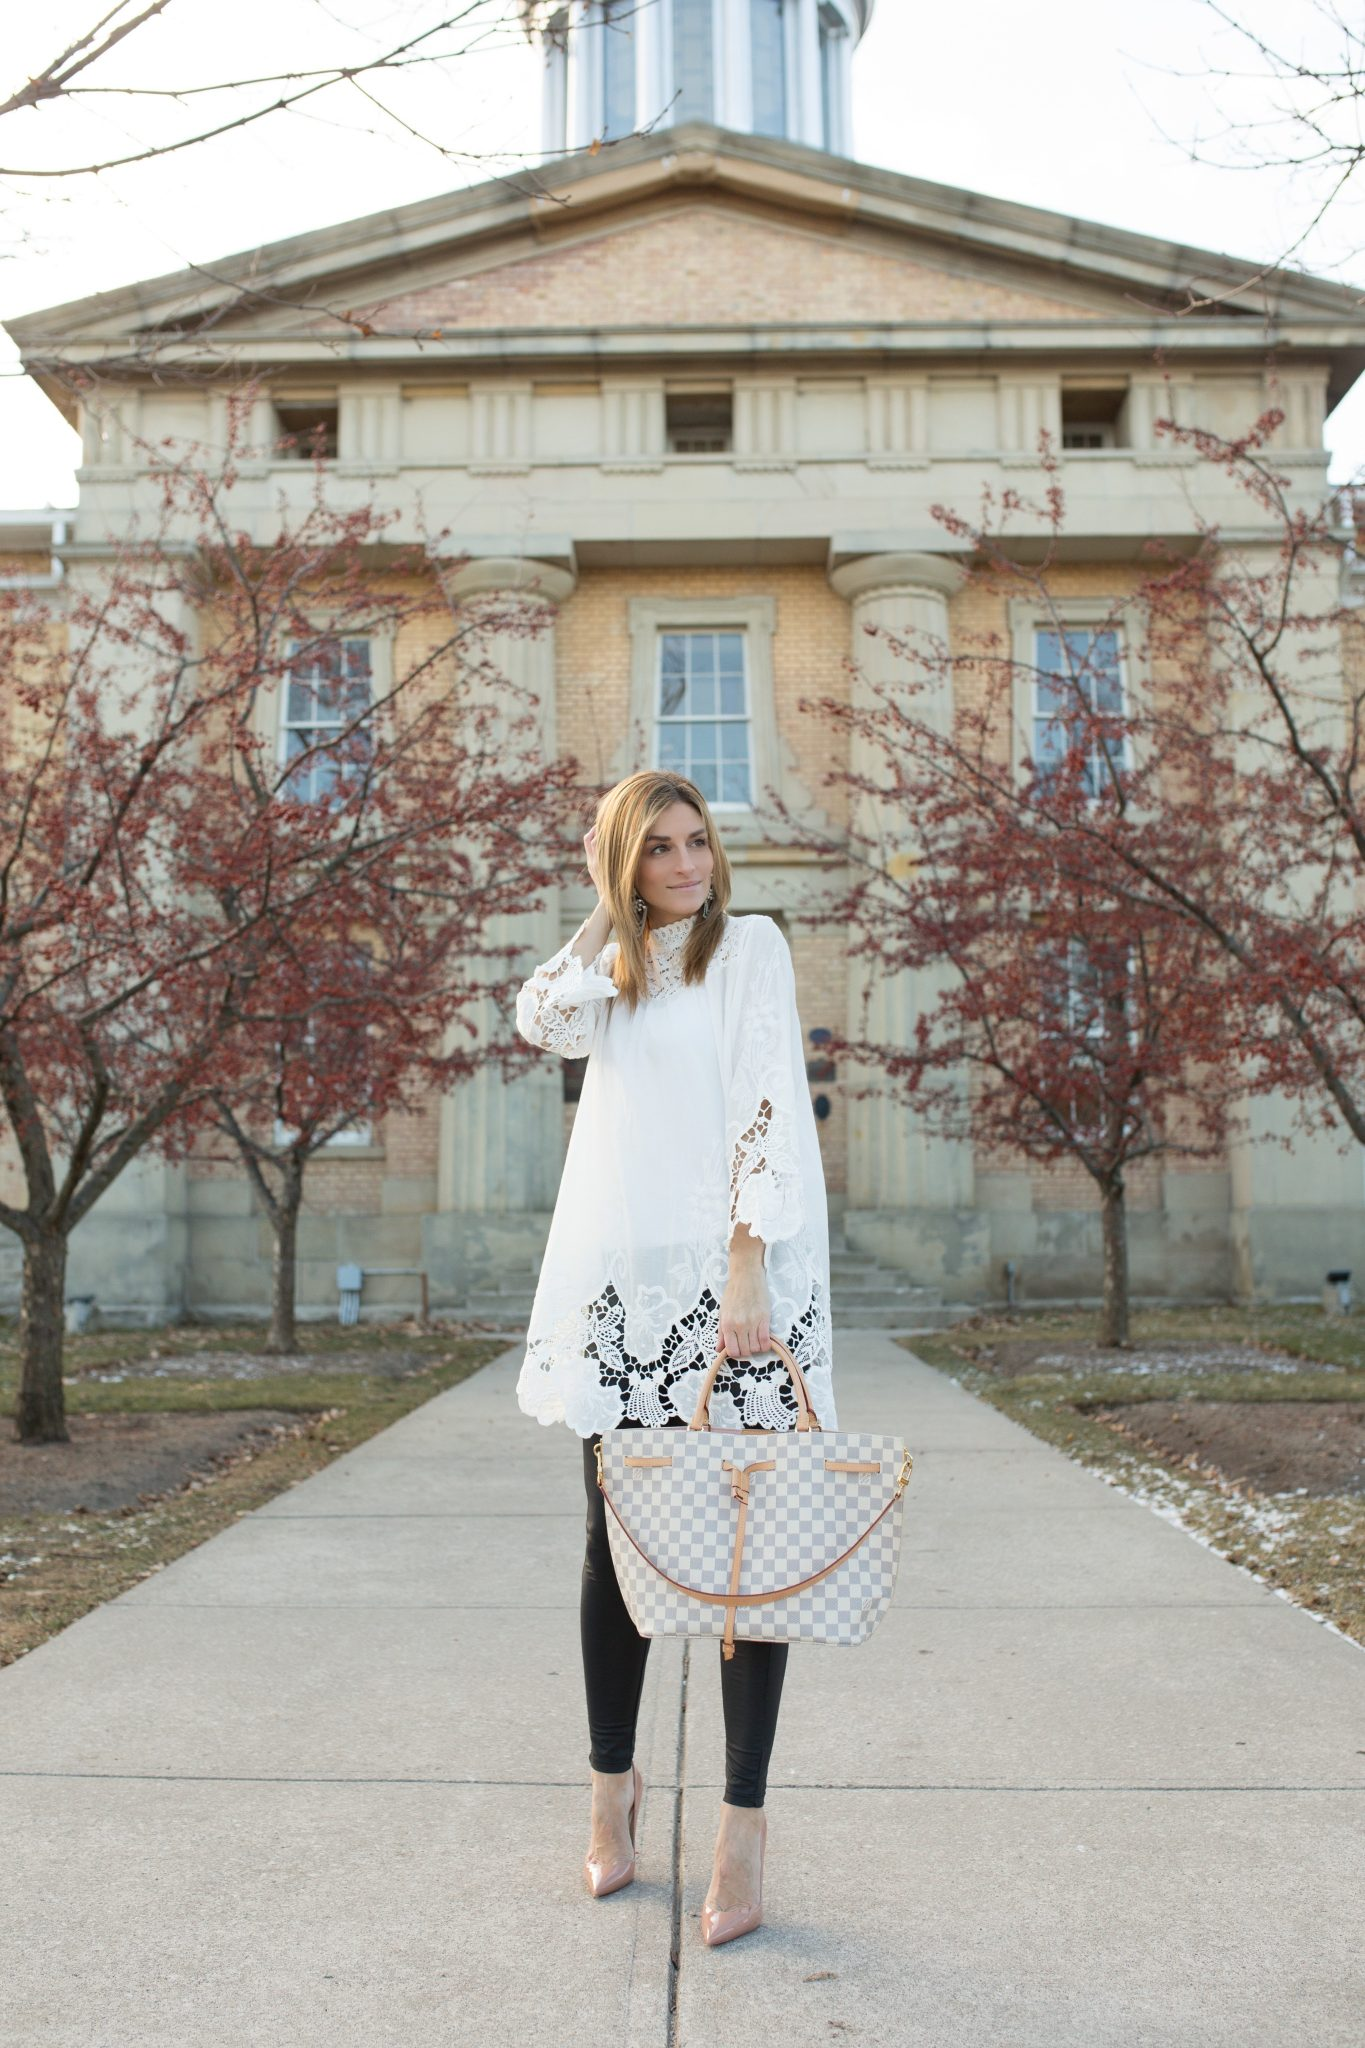 White Tunic with cut out detail, pleather leggings, nude Christian Louboutin heels, Louis Vuitton Girloata Bag sparkleshinylove Mandy Furnis